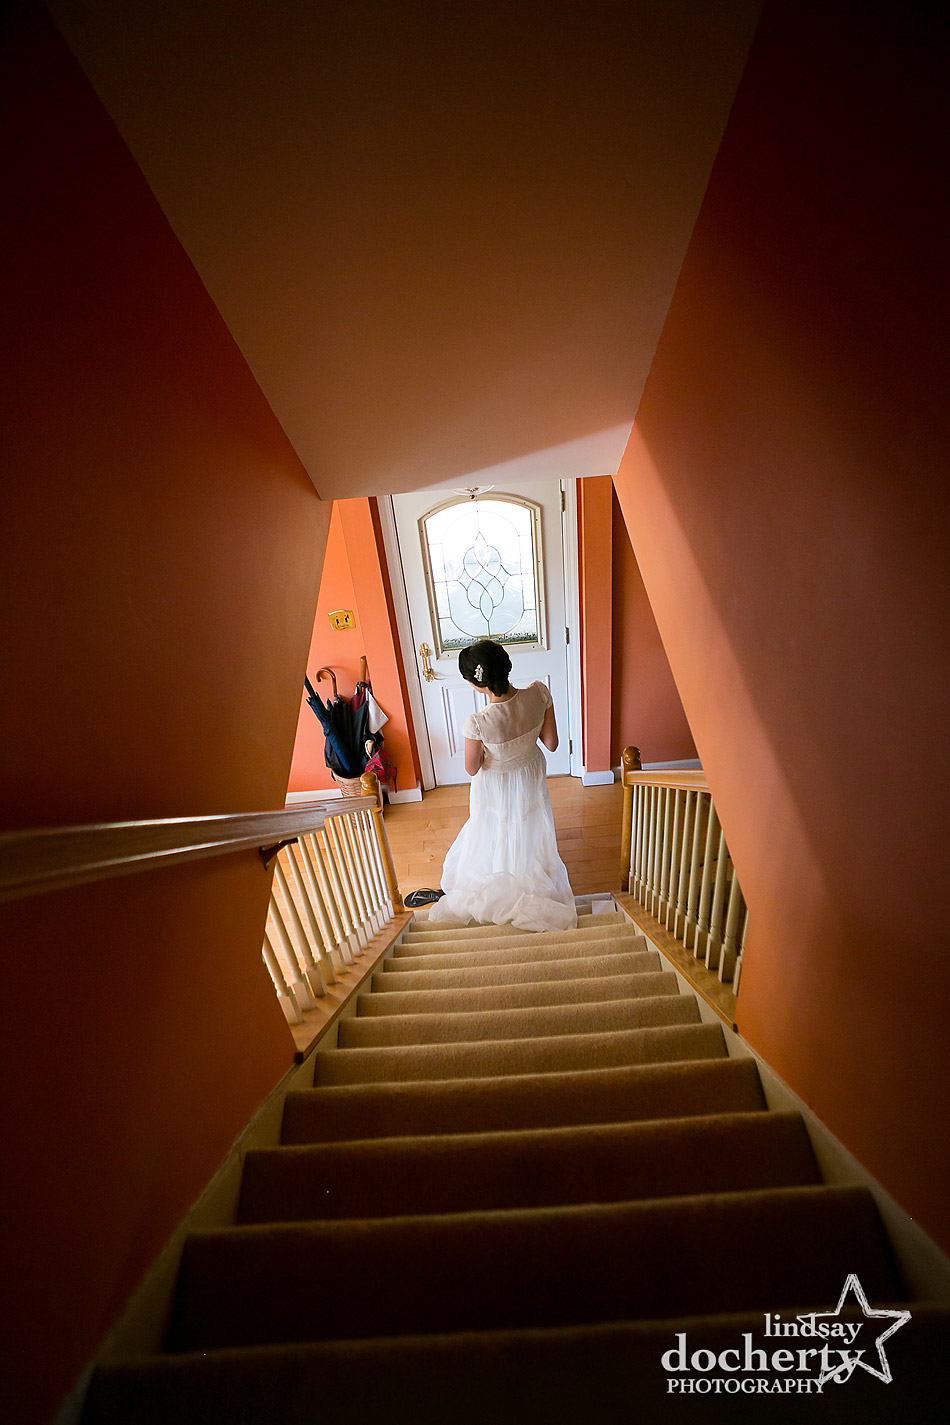 bride-walking-down-stairs-on-morning-of-wedding